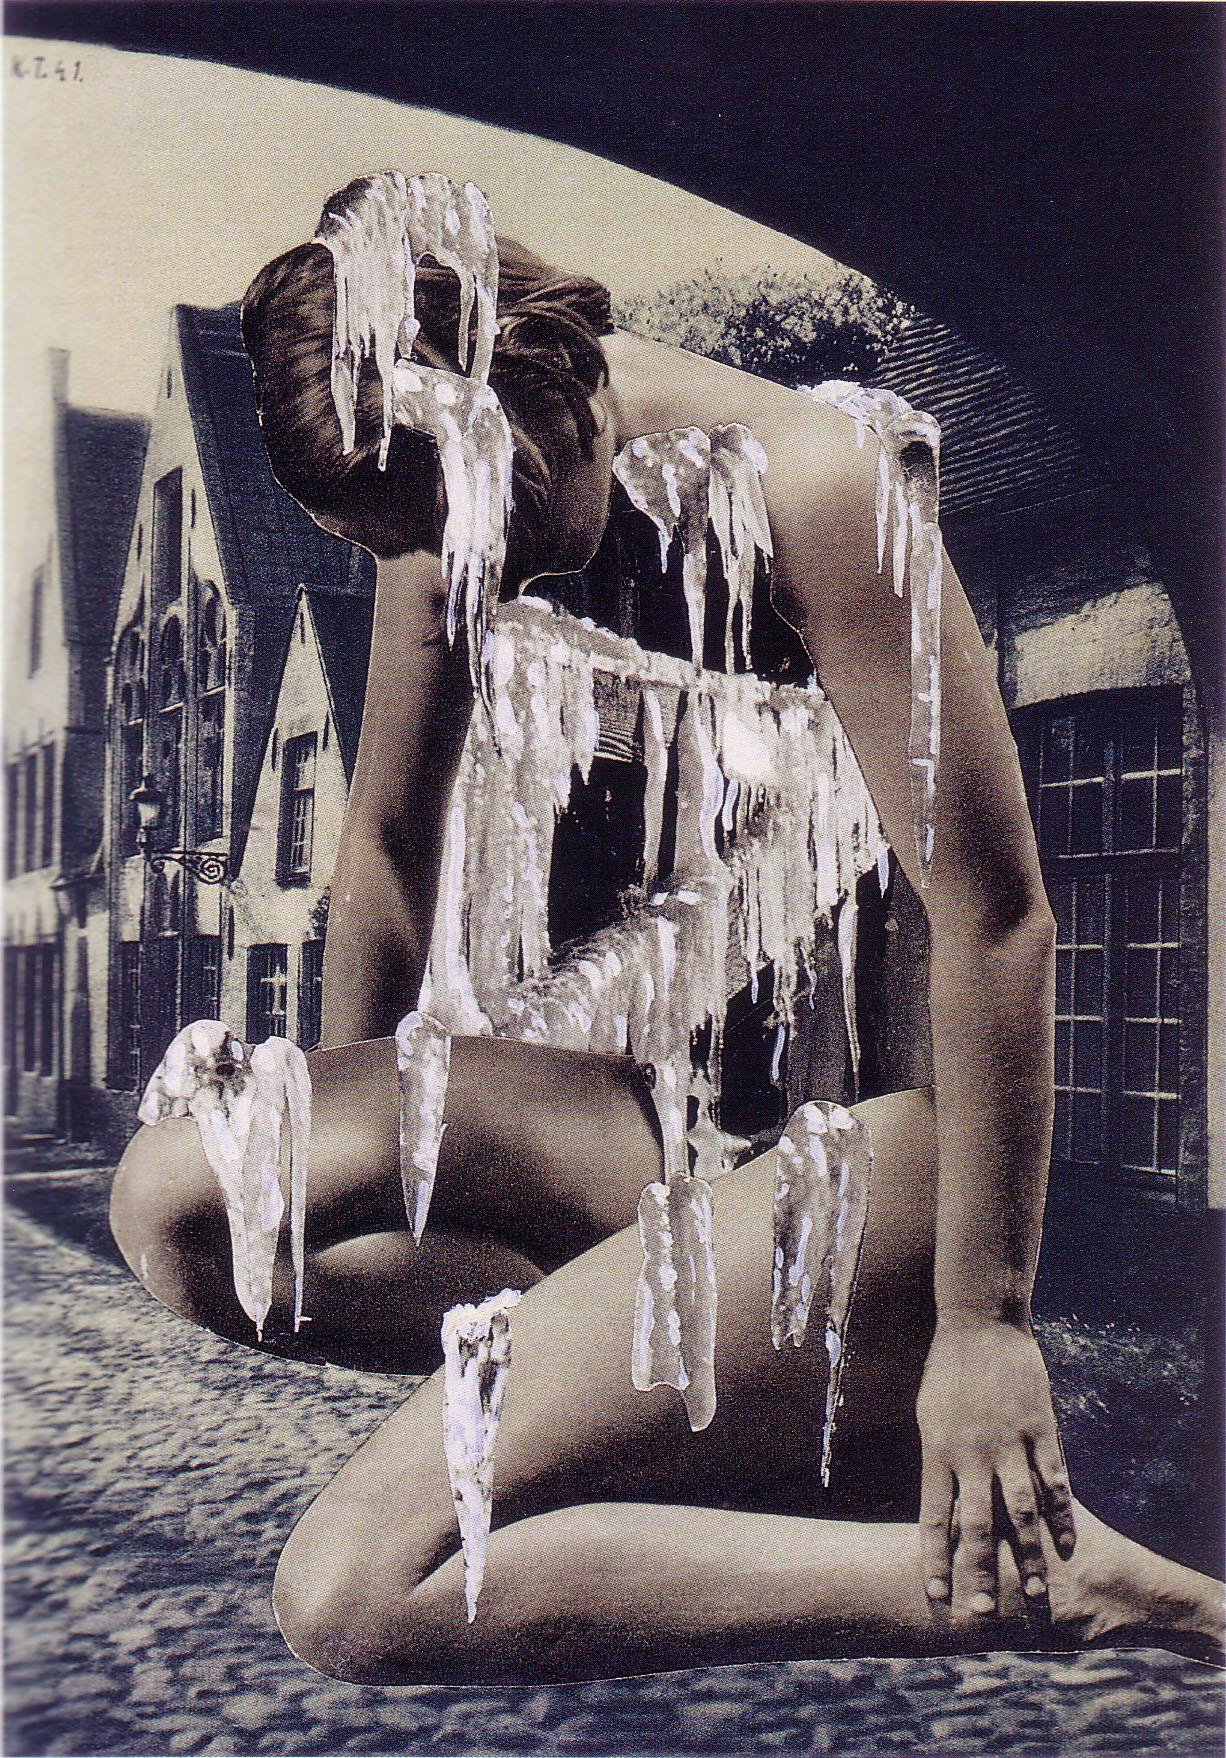 Karel Teige- Collage #188, 1941(c) Nachlass Karel Teige